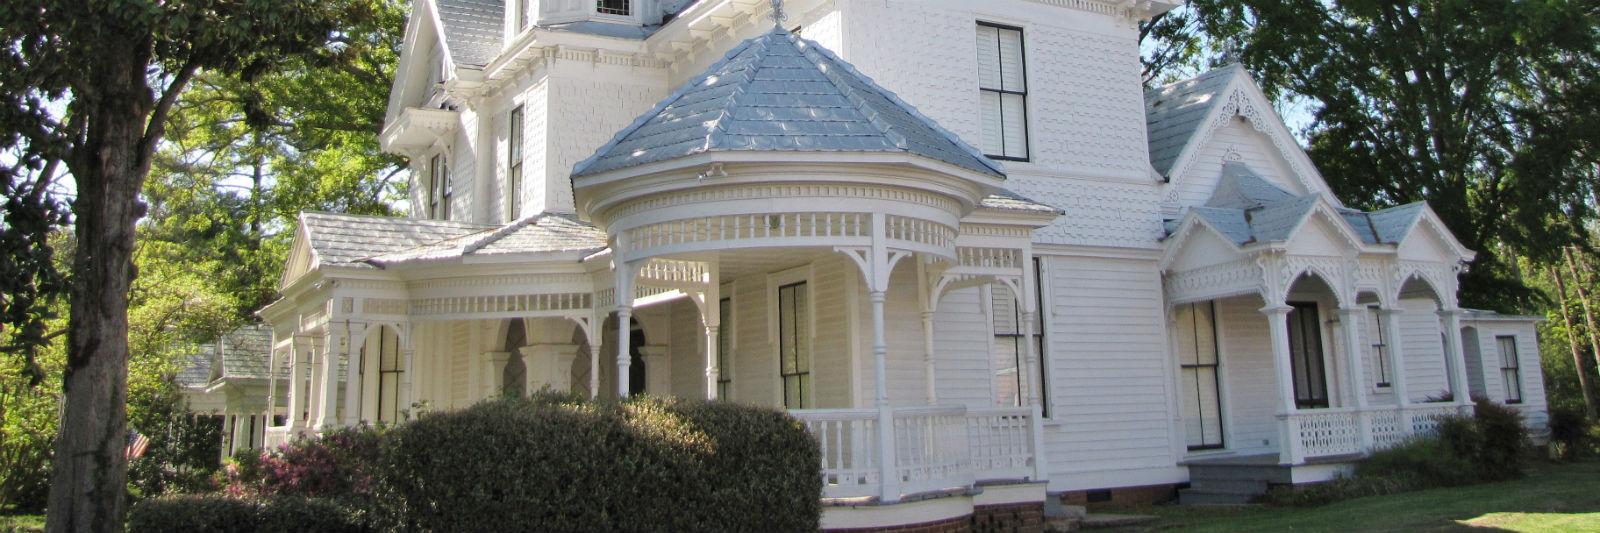 1-May-House_1850_1600x533.jpg